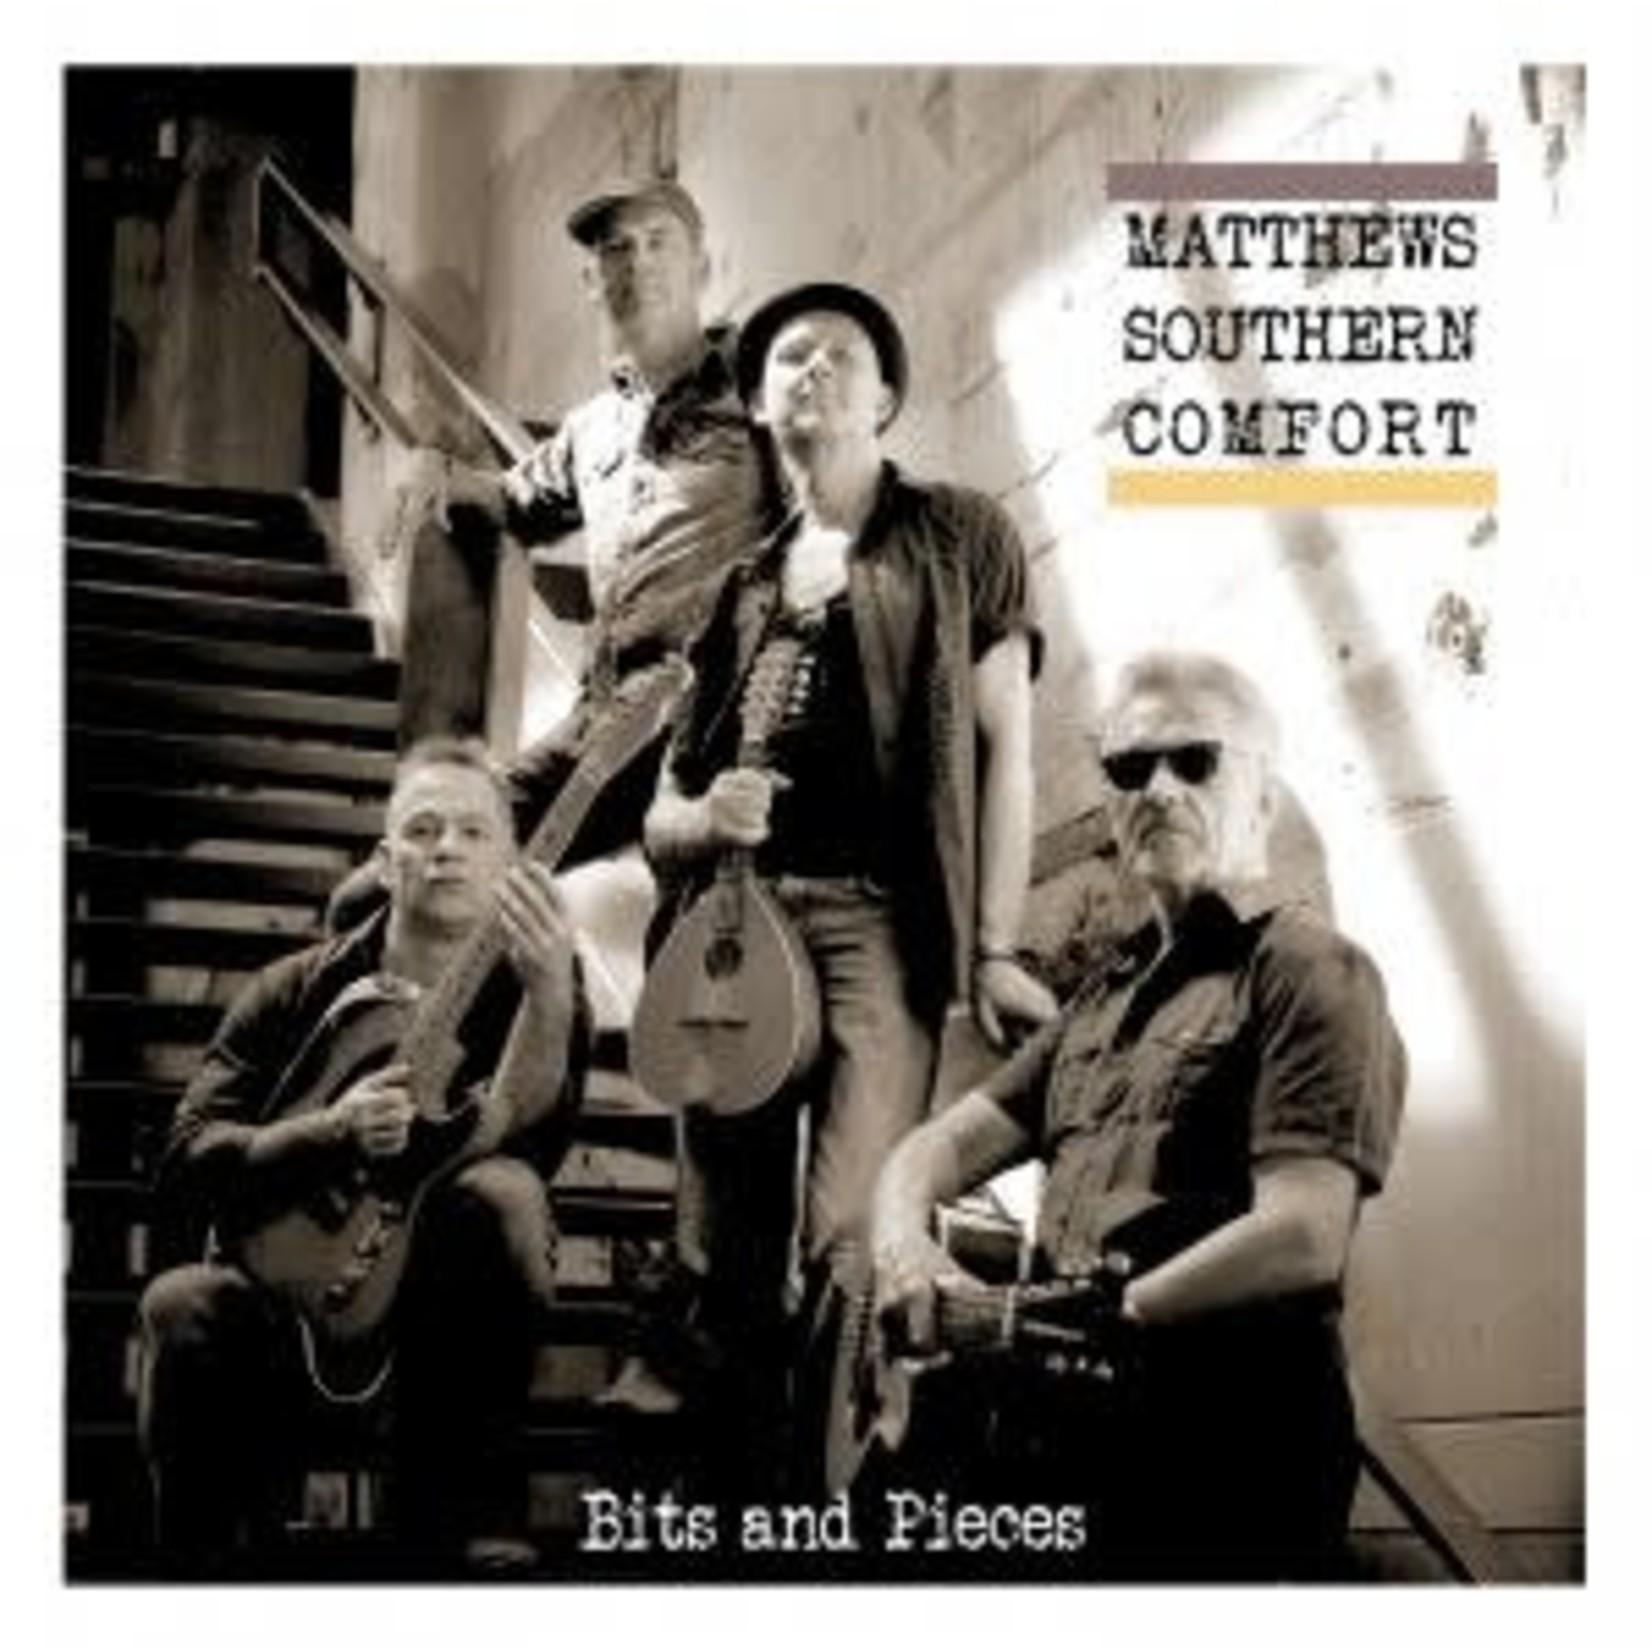 Matthews Southern Comfort - Bits and Pieces (10''white vinyl)   (VINYL)